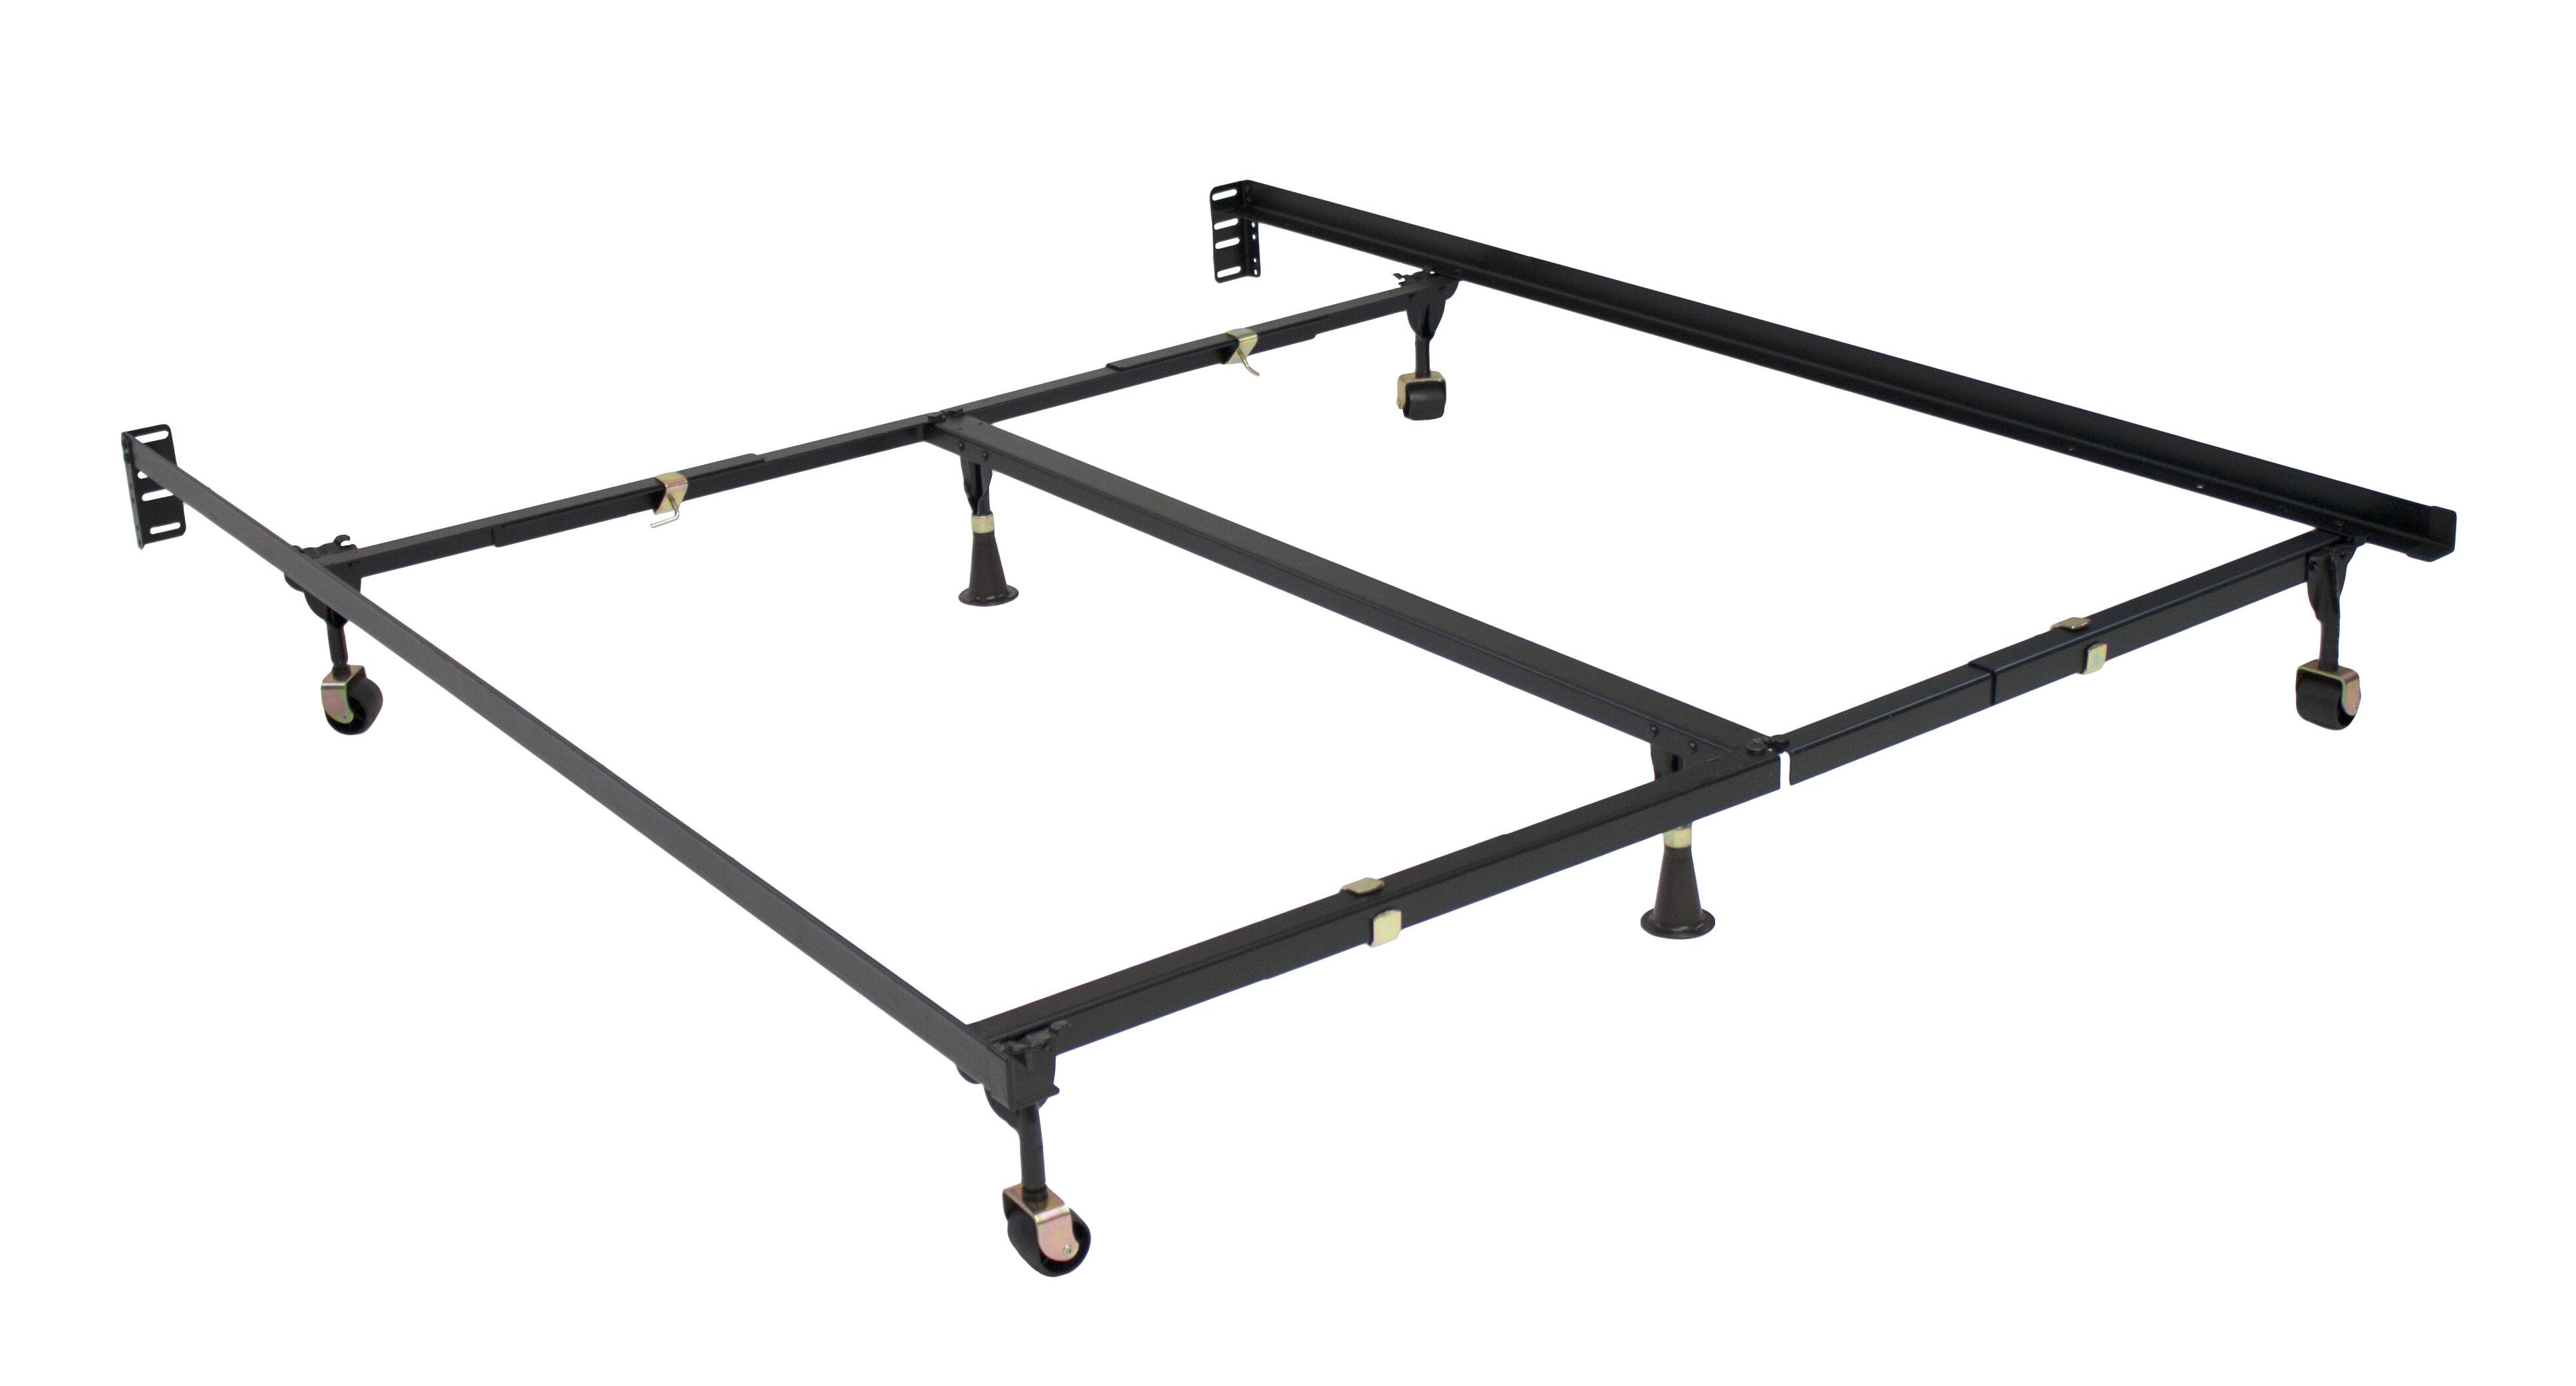 Alwyn Home Stabl-Base Premium Elite Clamp Style Bed Frame | Wayfair